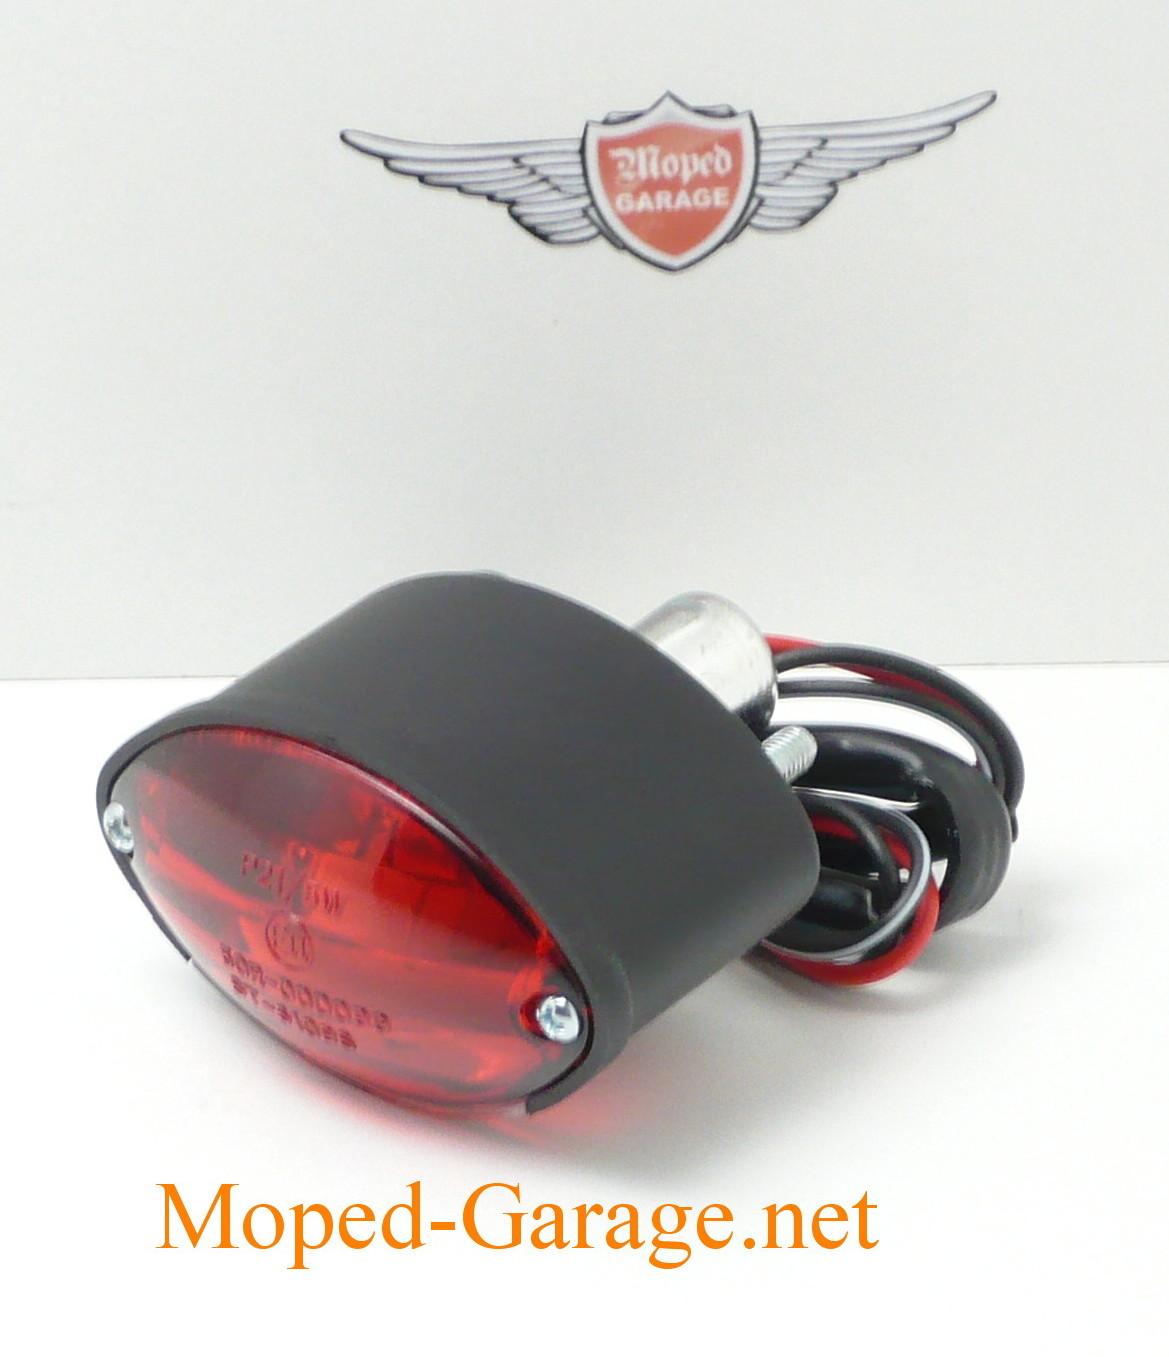 moped harley motorrad mini cat eye matt. Black Bedroom Furniture Sets. Home Design Ideas